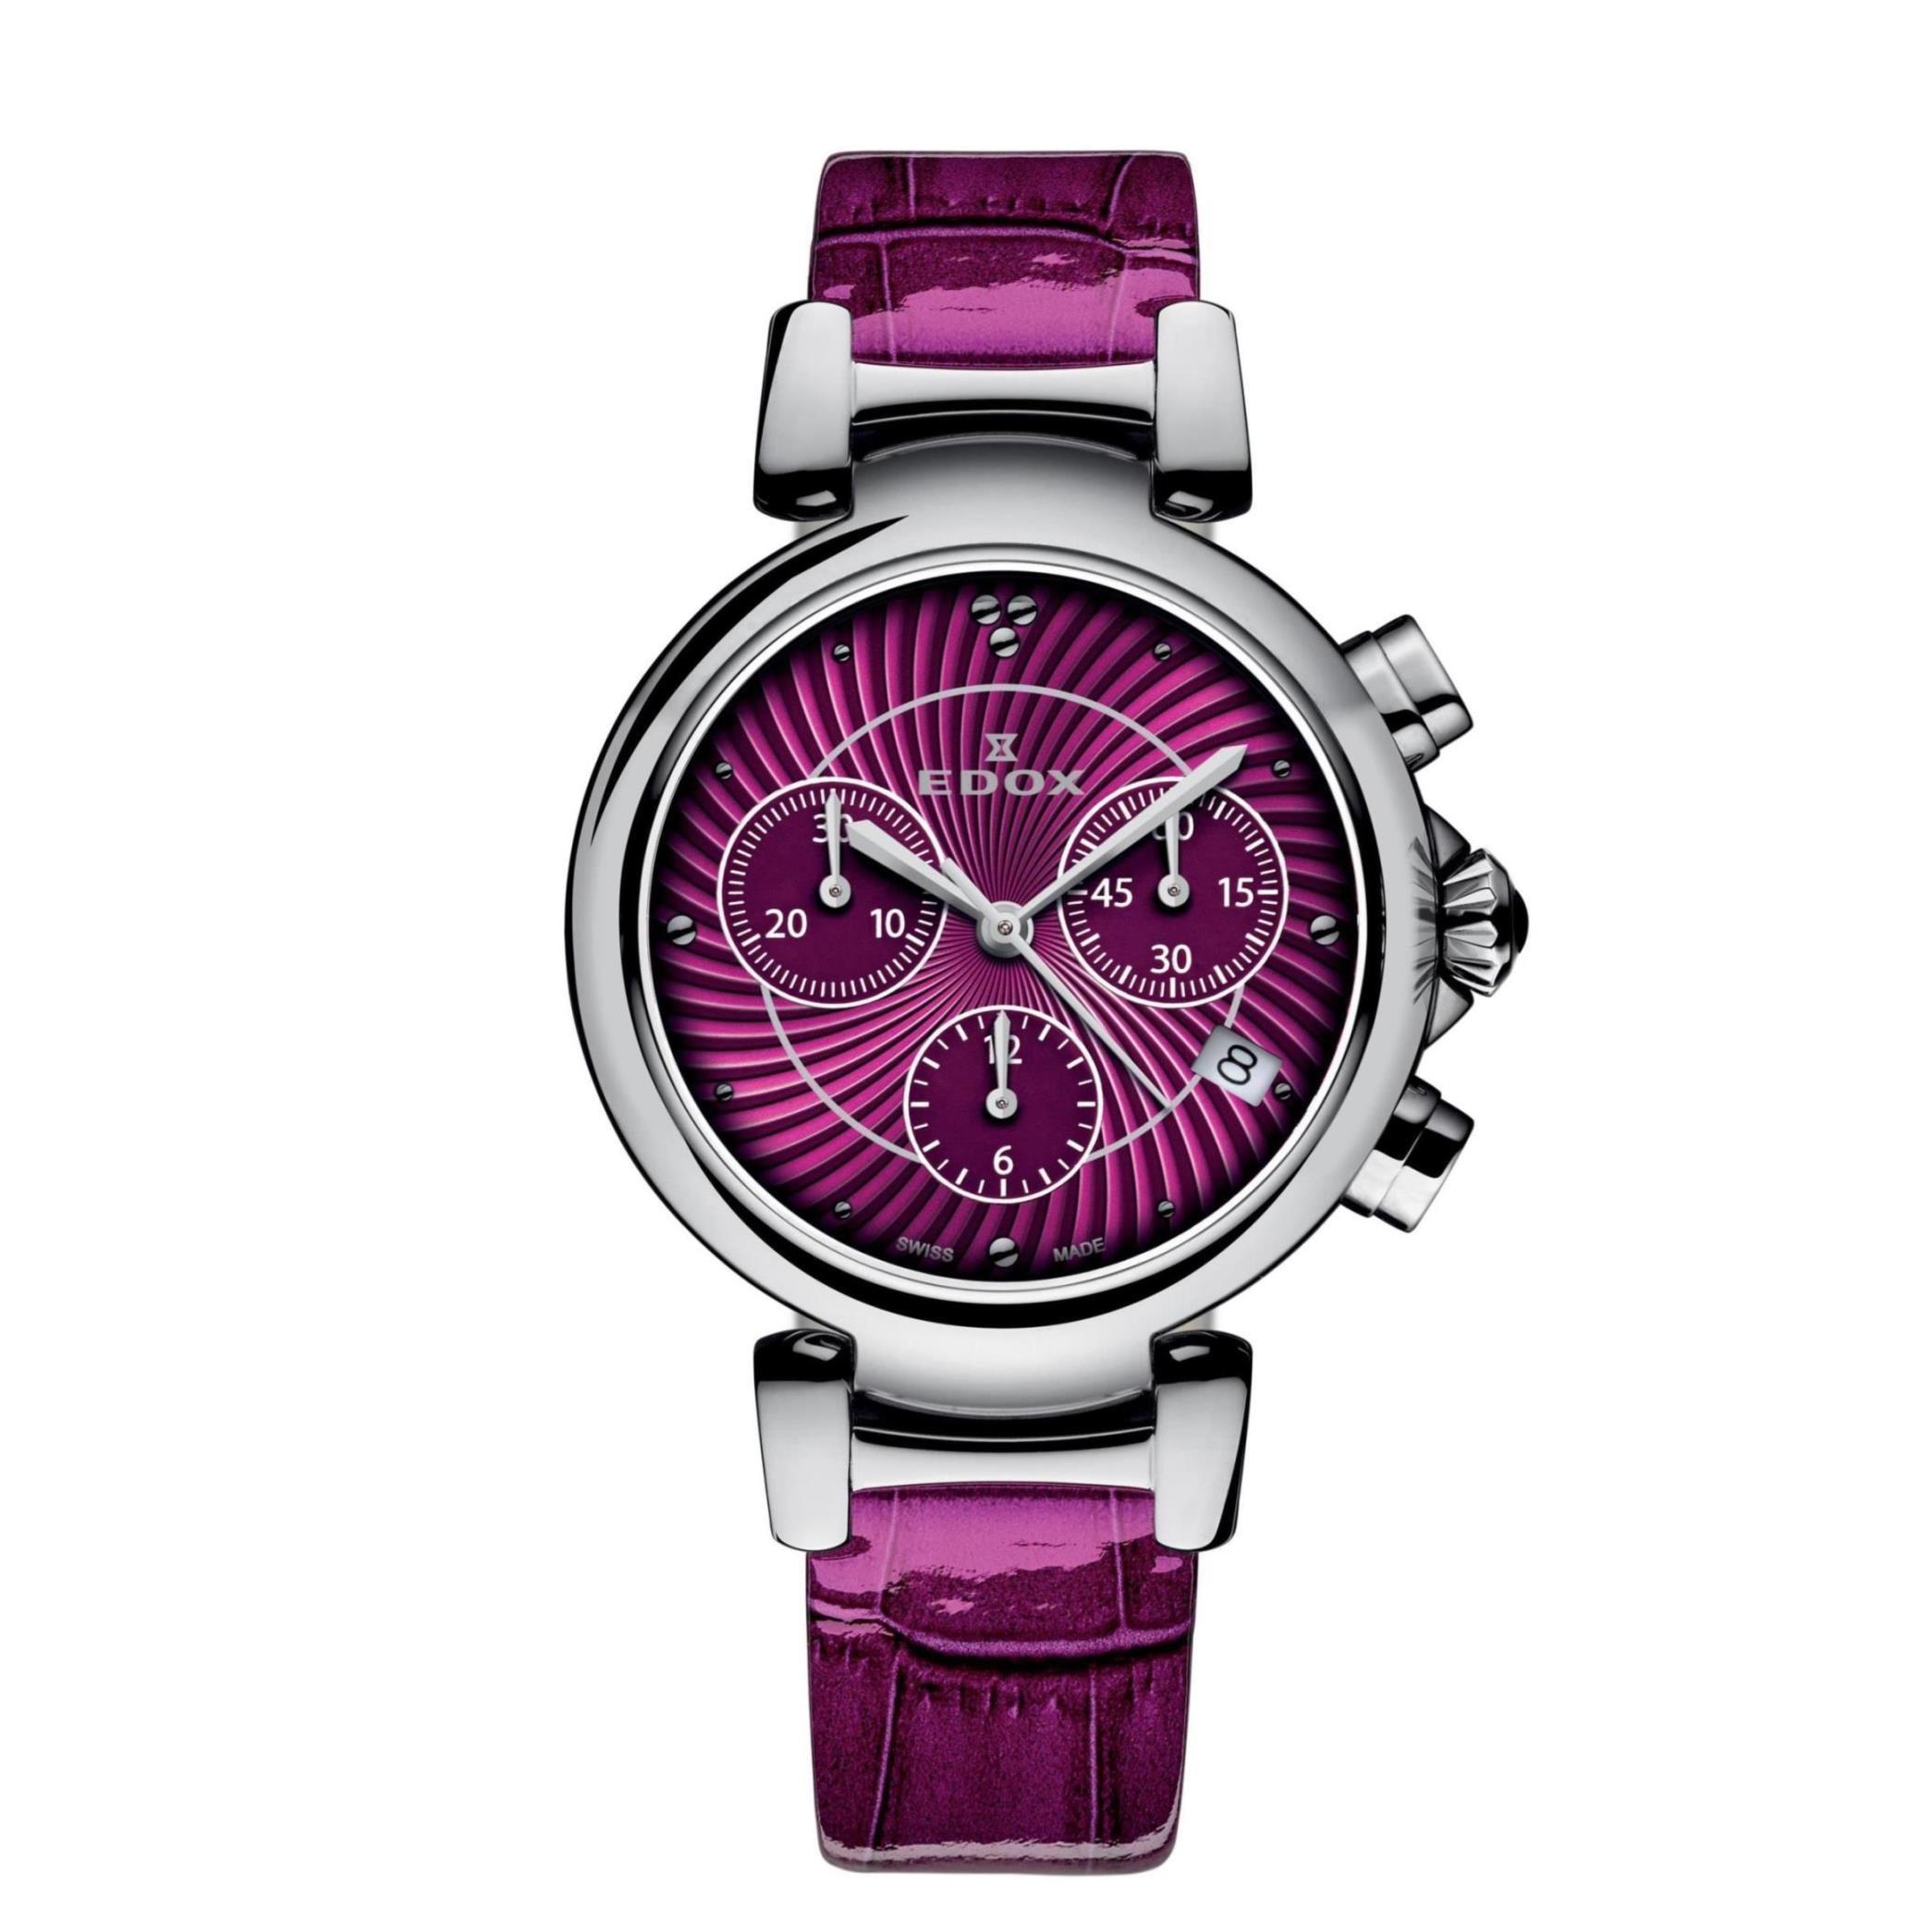 Edox Women's 10220 3C ROIN LaPassion Analog Display Swiss Quartz Pink Watch